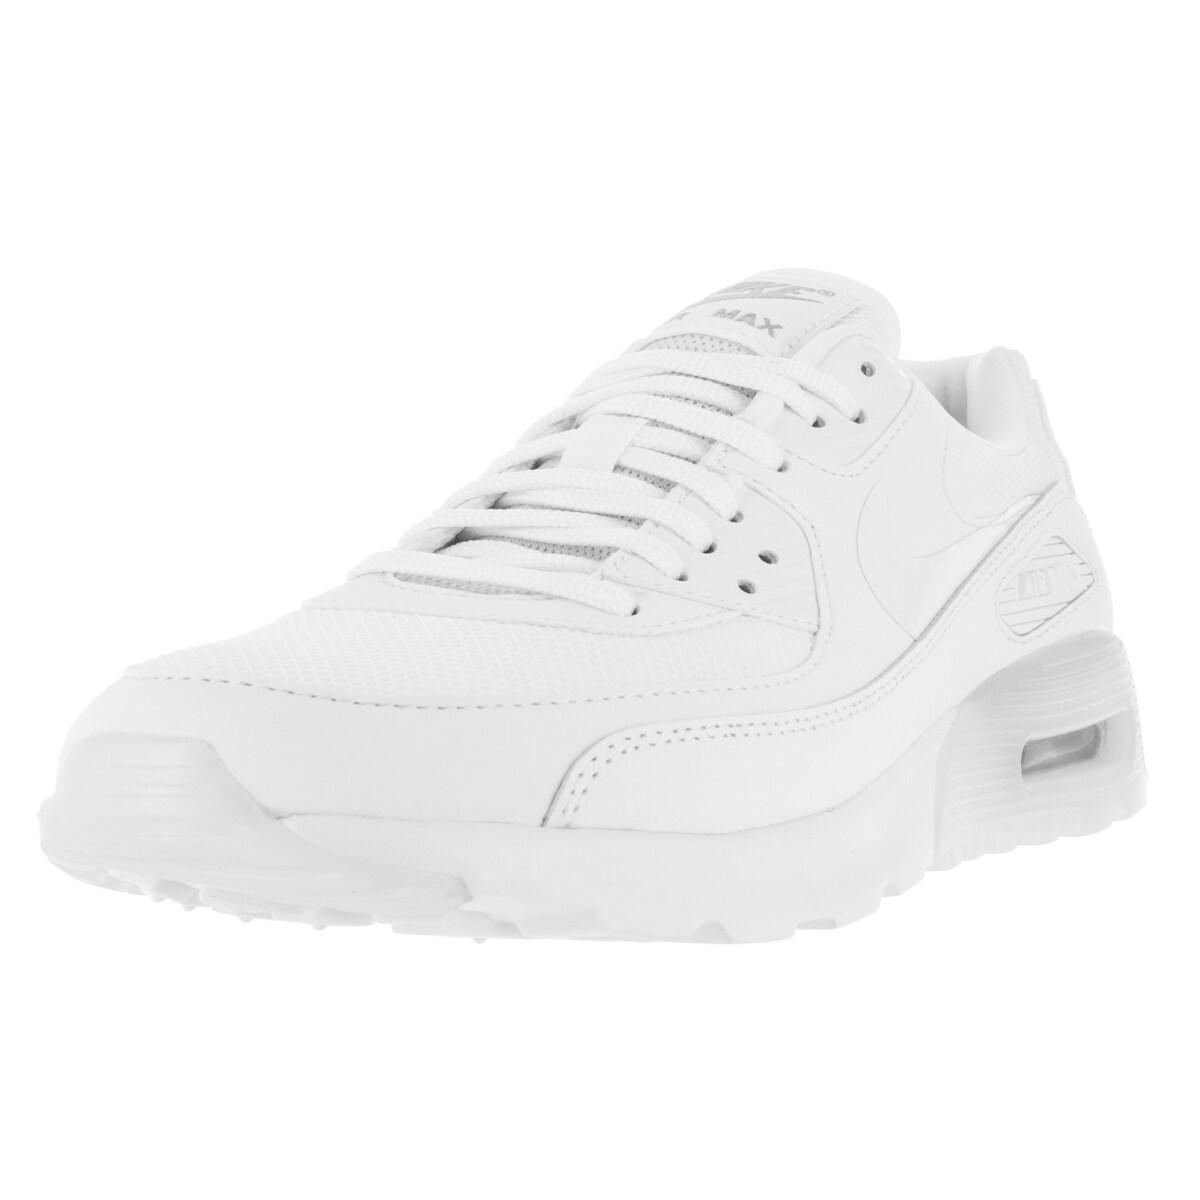 Nike Air Max 90 Ultra Essential White White Metallic Silver